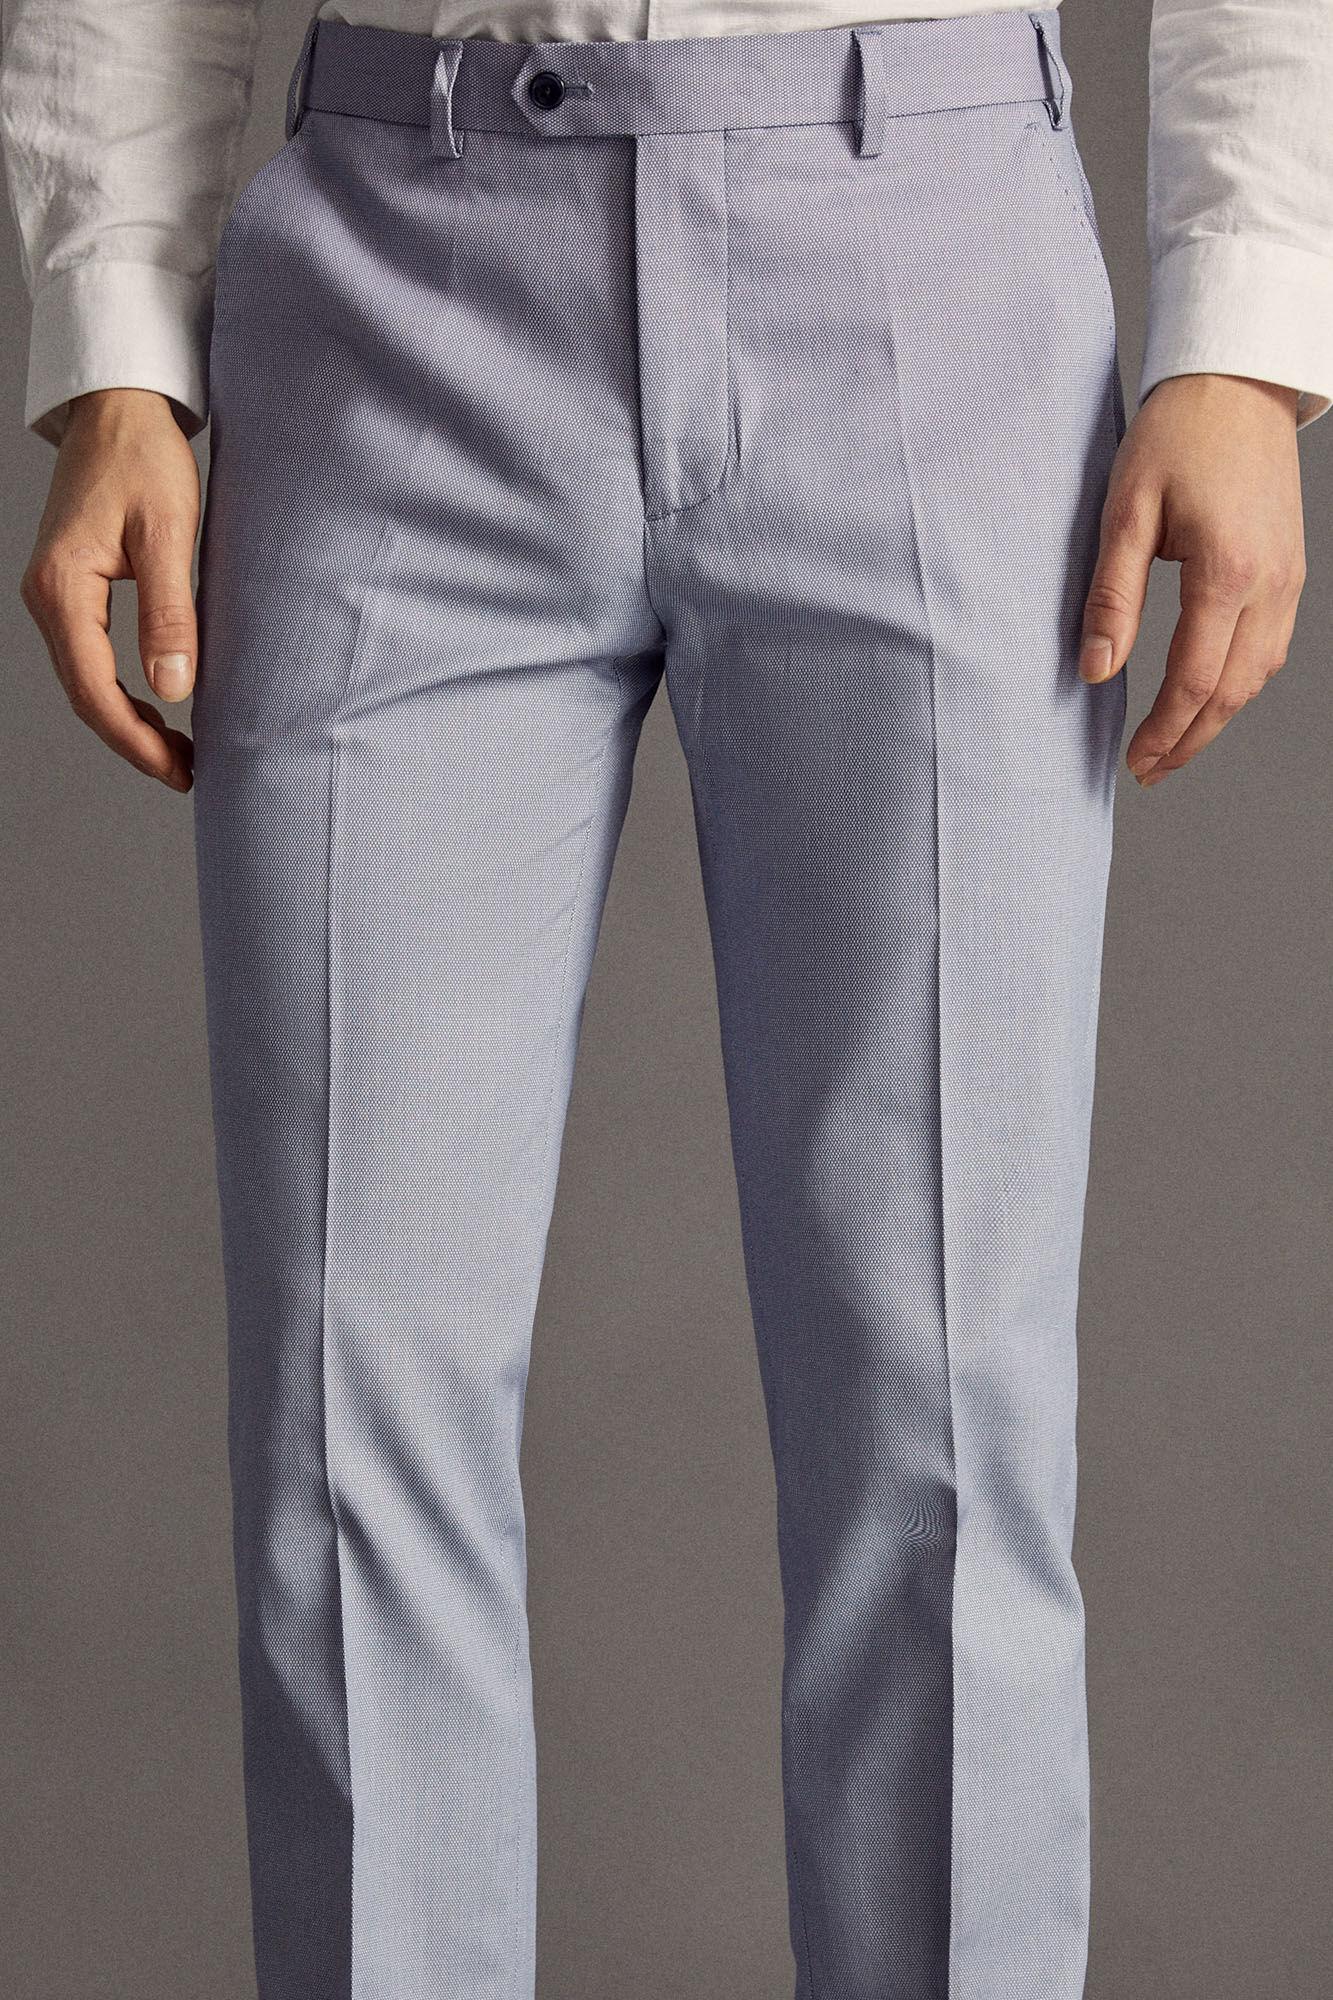 7ddd93962 pantalón algodón ojo perdiz slim fit